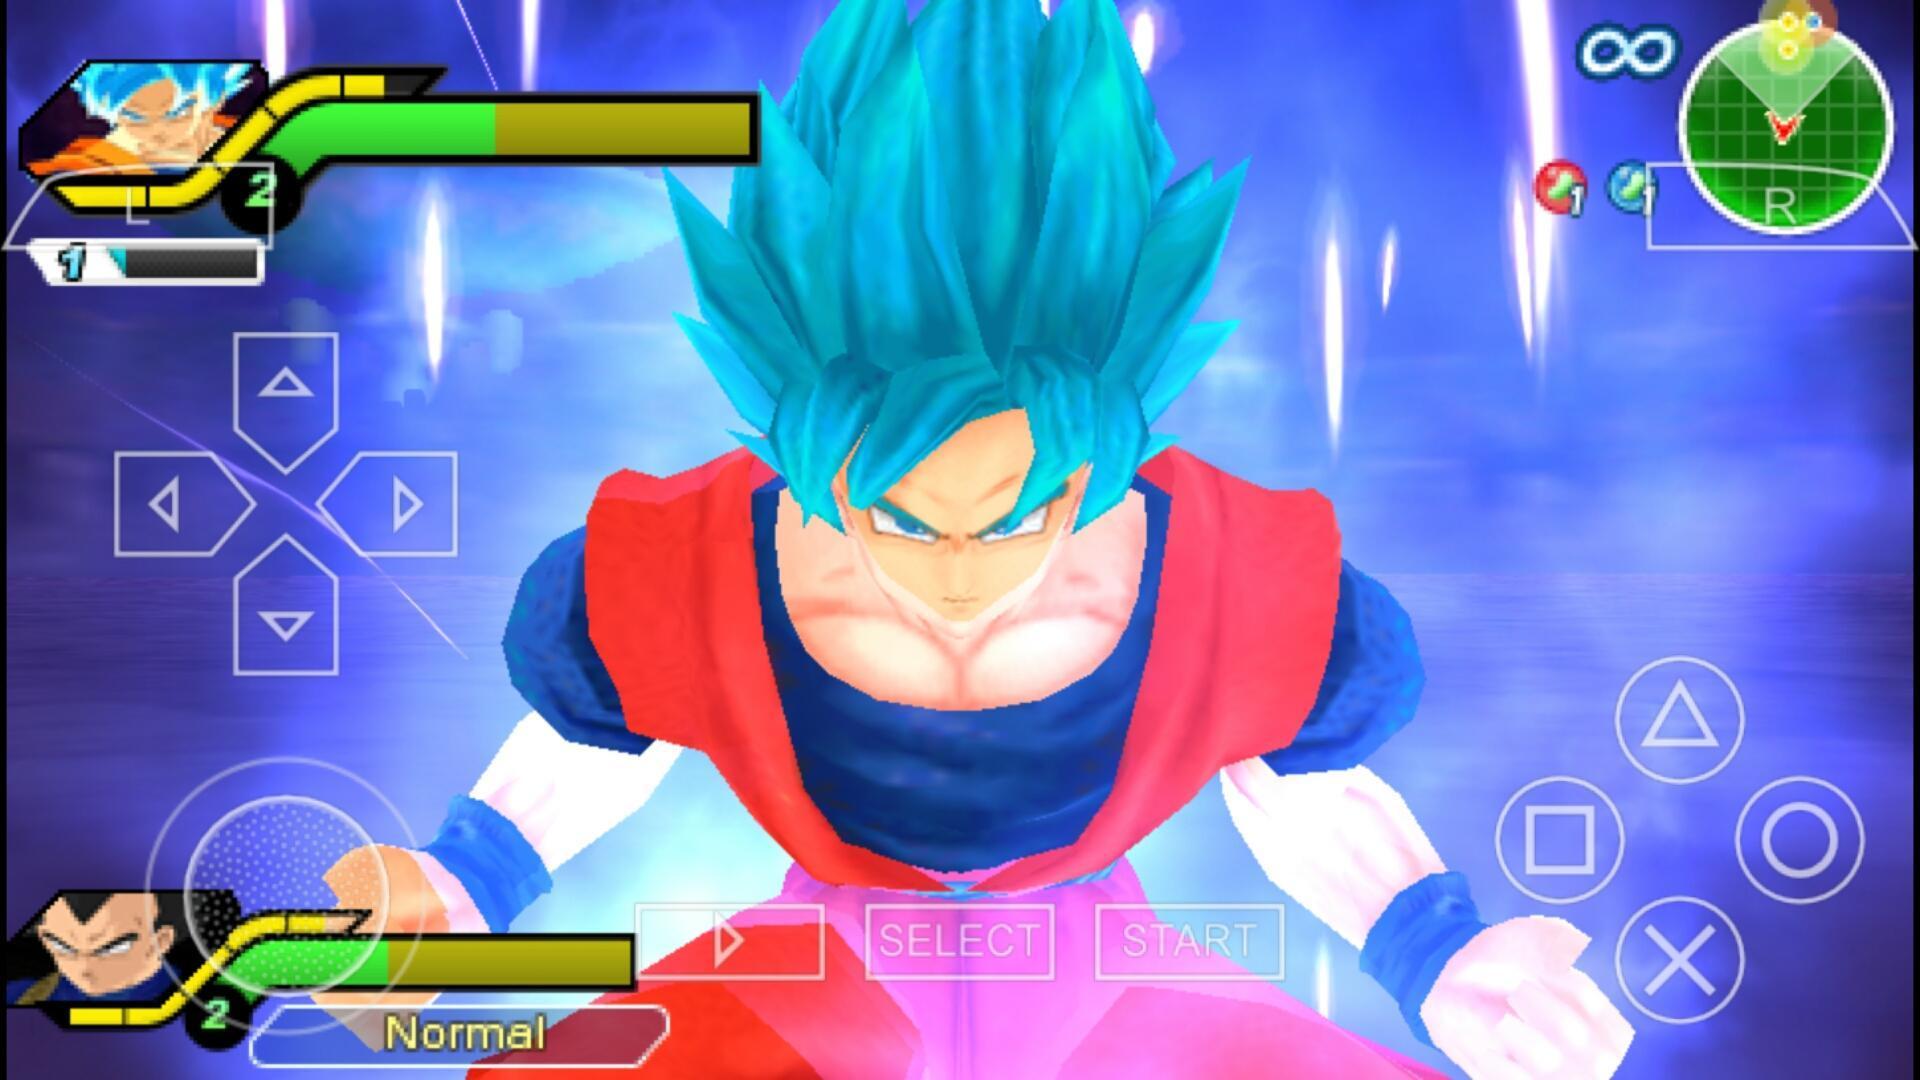 dragon ball z tenkaichi tag team unlock all characters cheat